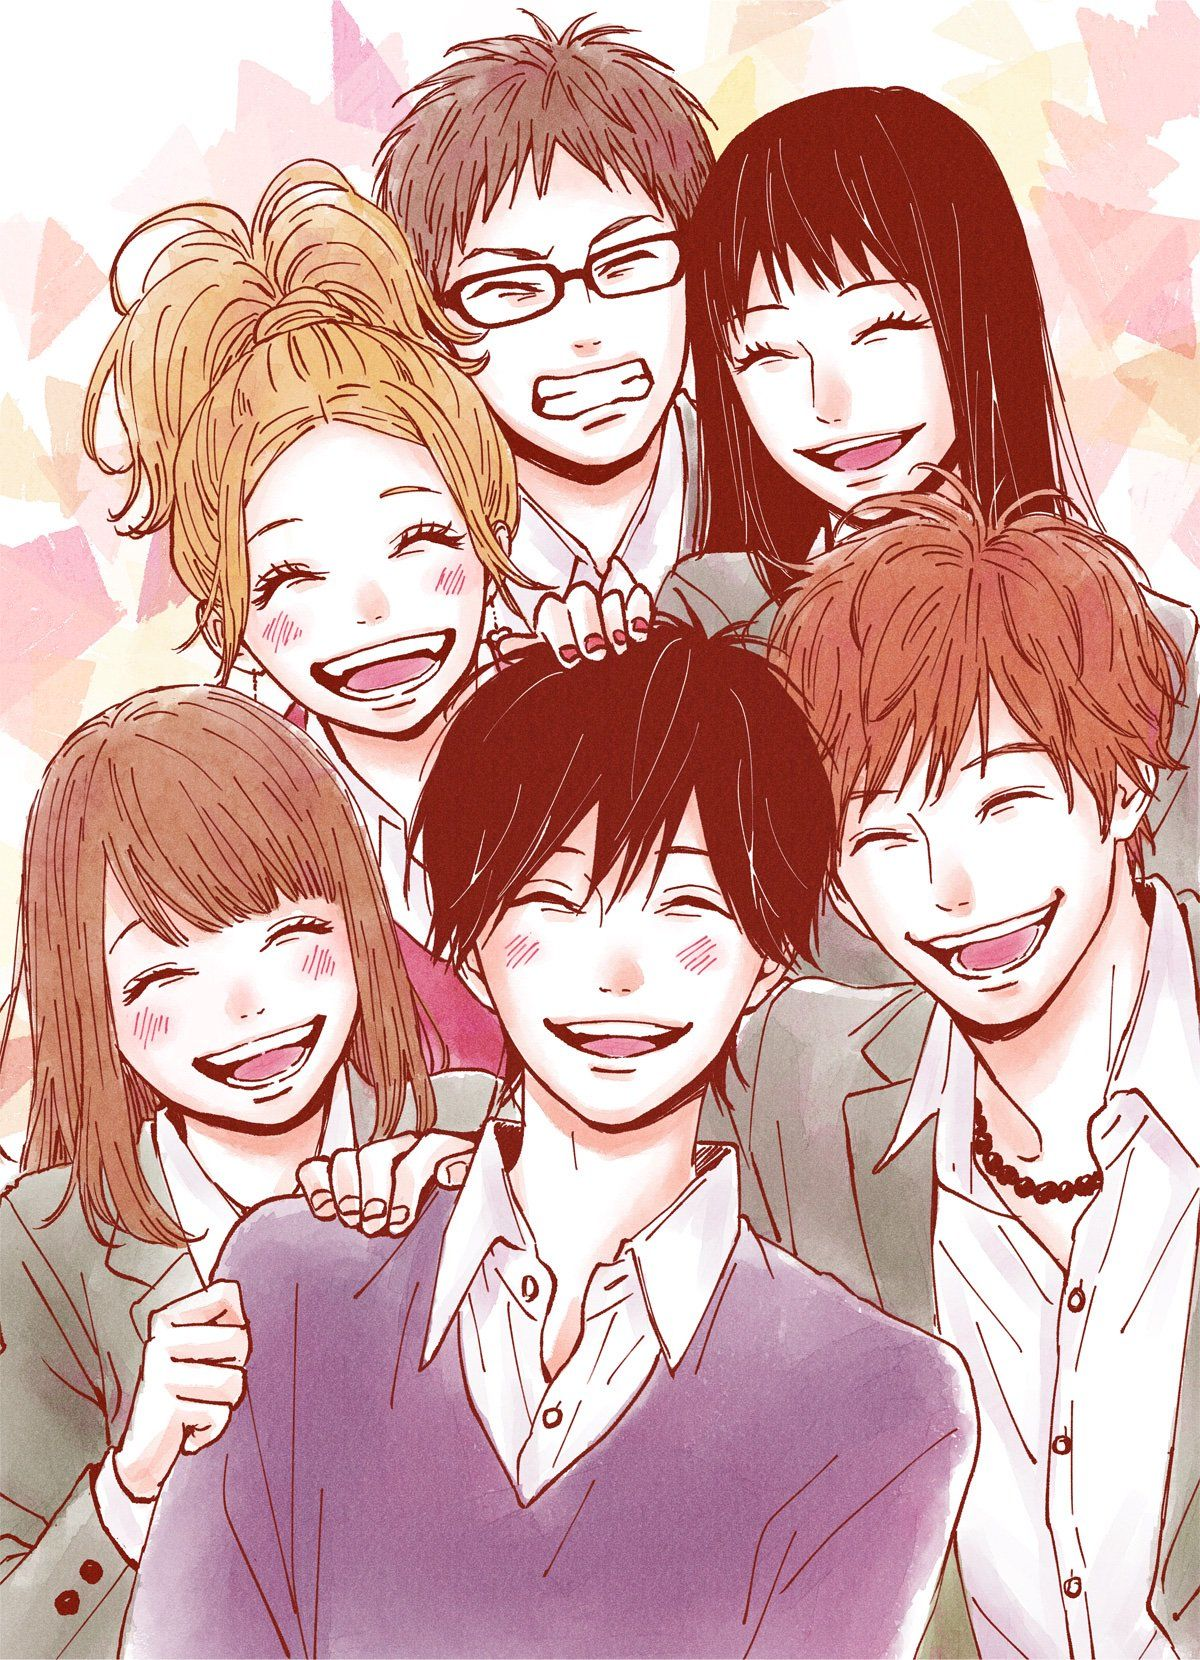 Ichigo Takano 高野苺 On Twitter Anime Orange Friend Anime Anime